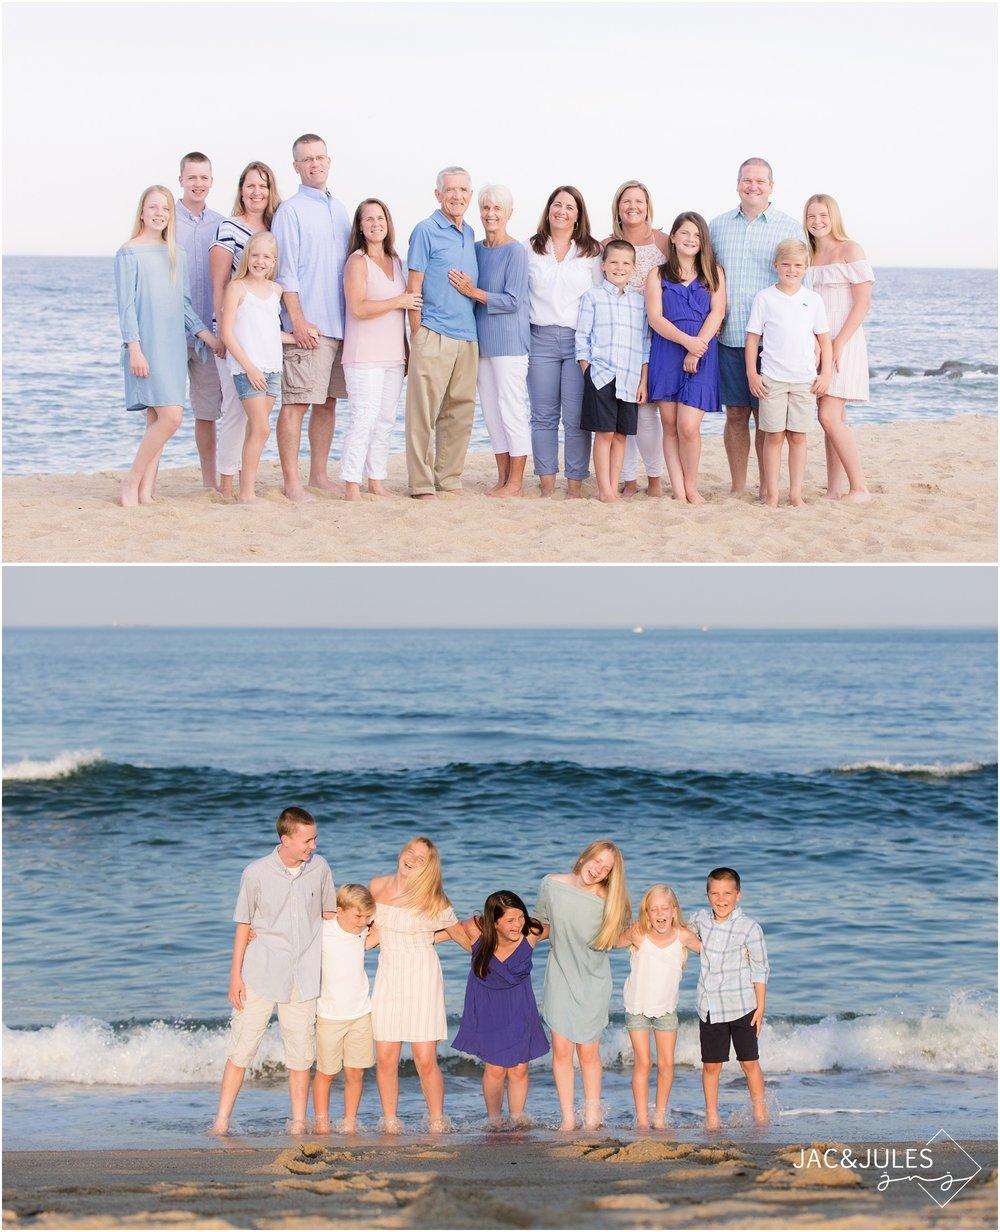 fun Extended family photo on the beach in Sea Girt, NJ